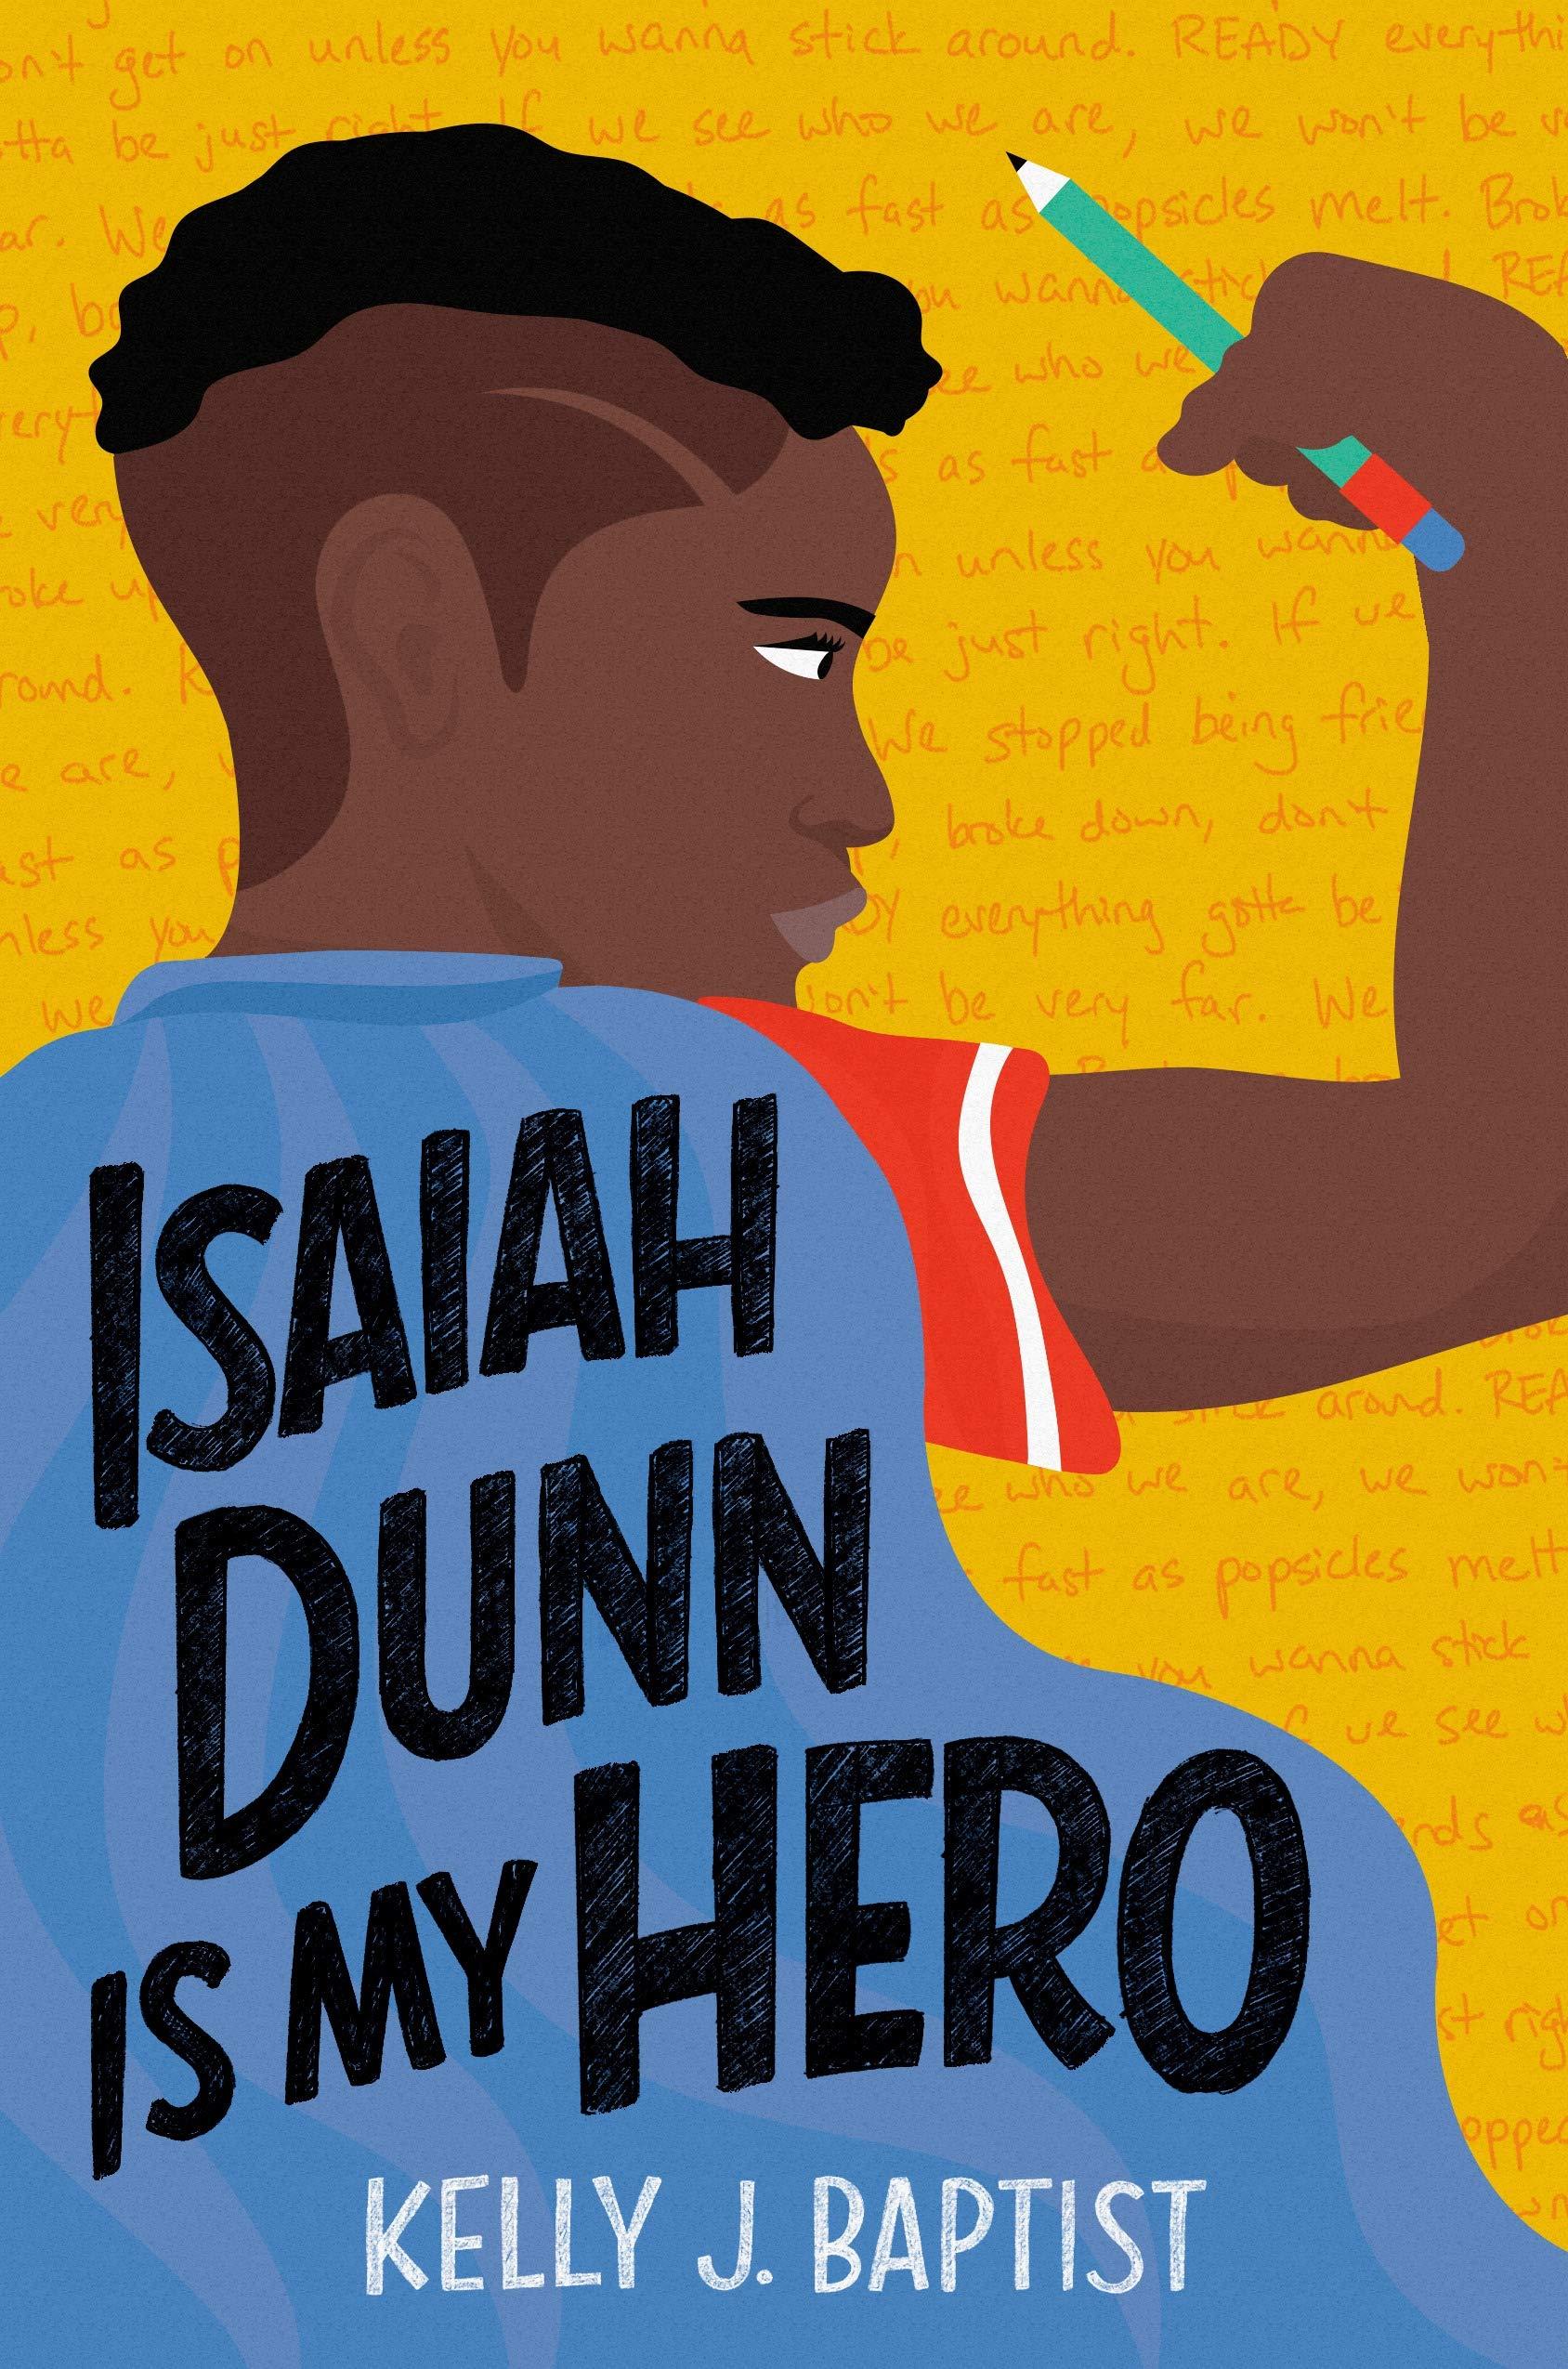 Isaiah Dunn Is My Hero: Baptist, Kelly J.: 9780593121368: Amazon.com: Books